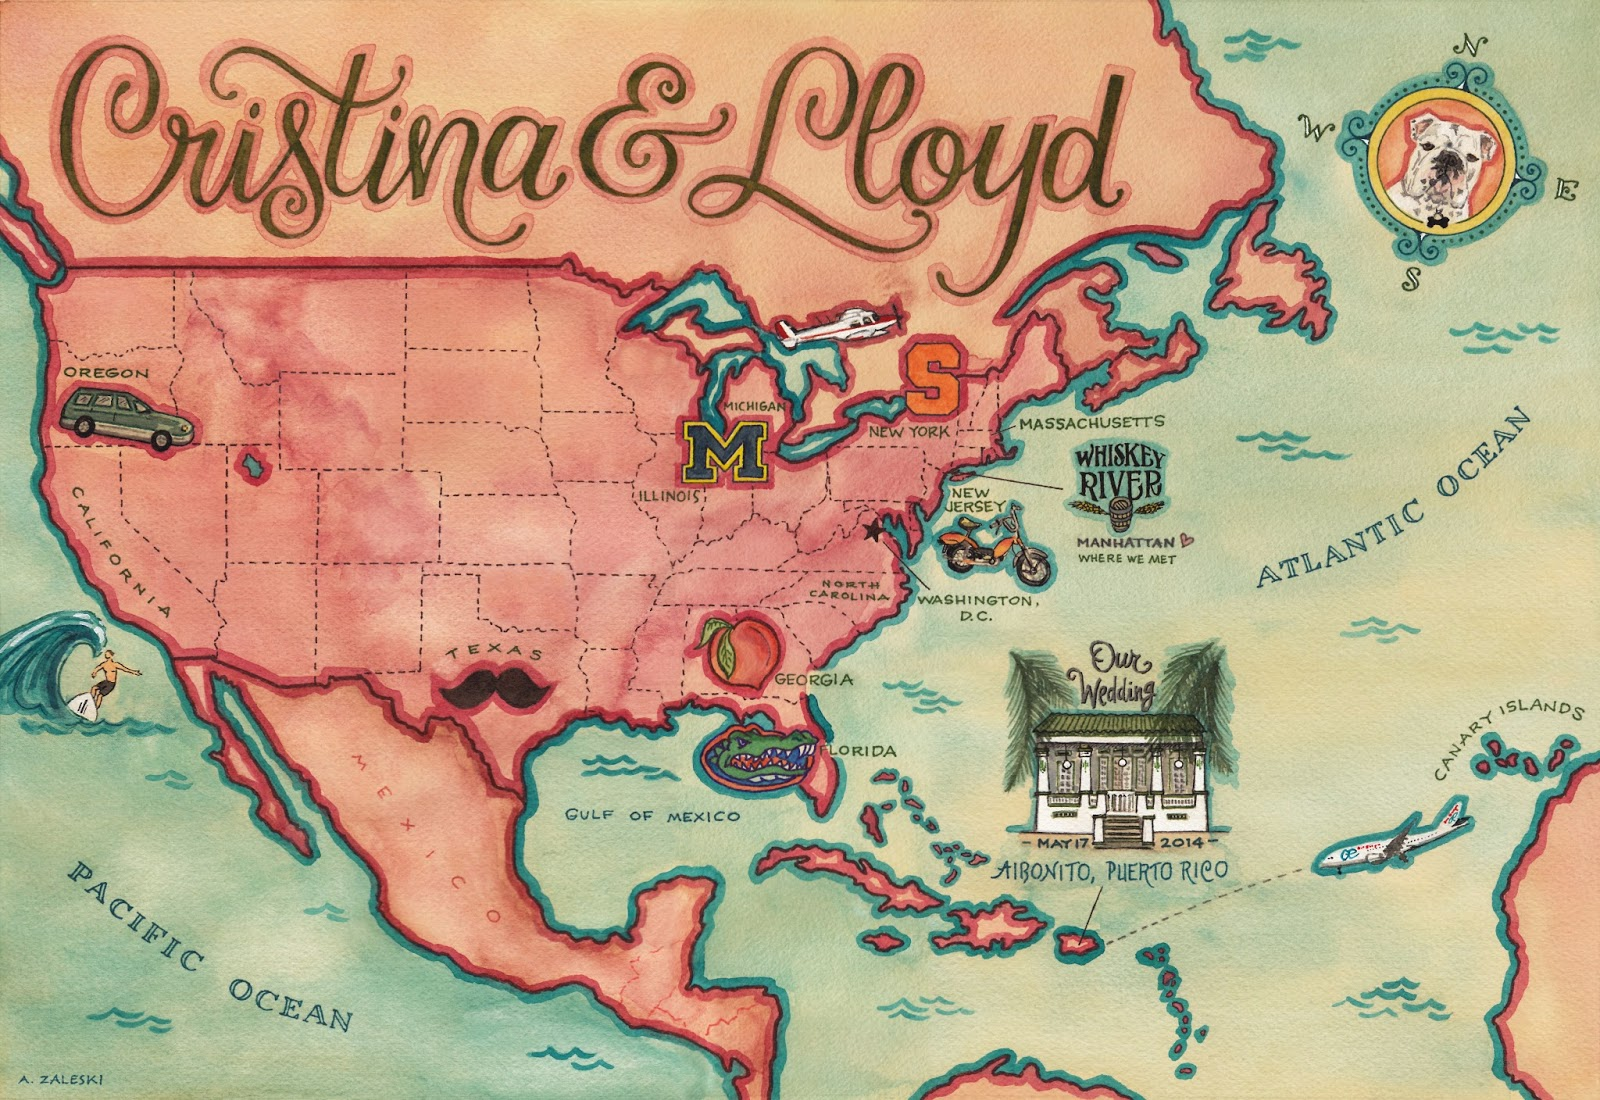 cristina lloyd s puerto rico wedding map